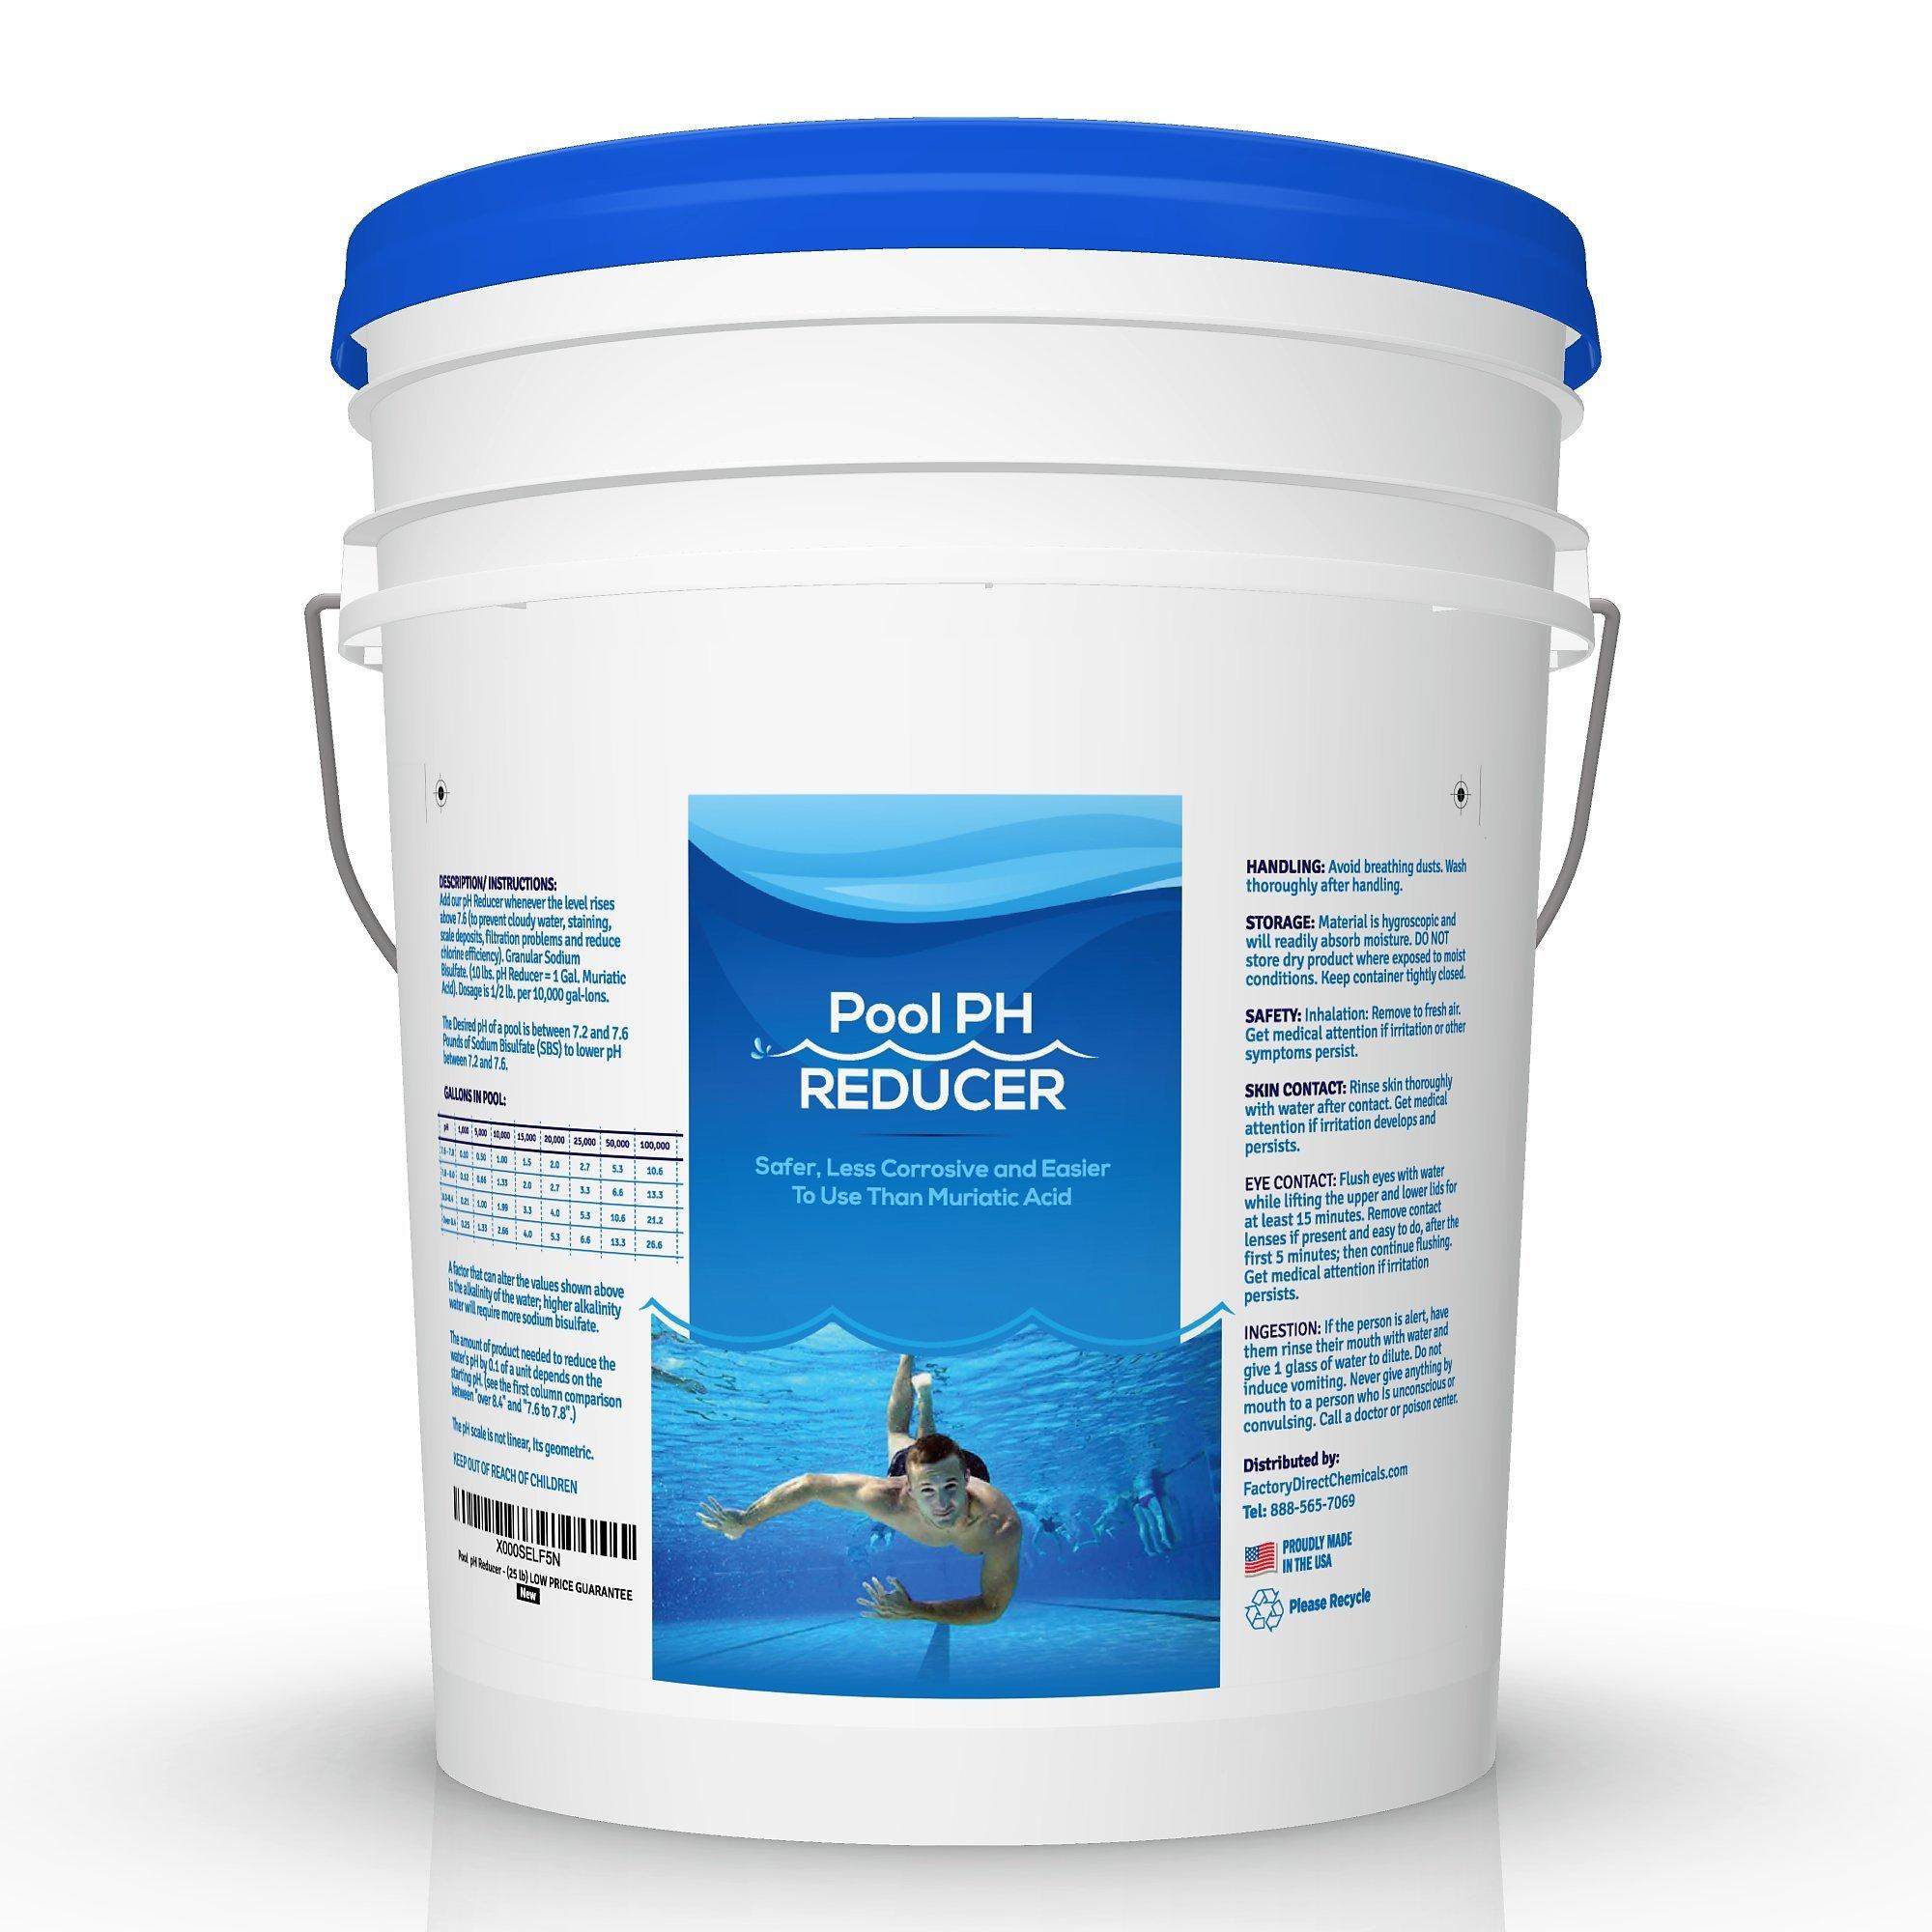 Pool PH Reducer - (25 lb) LOW PRICE GUARANTEE